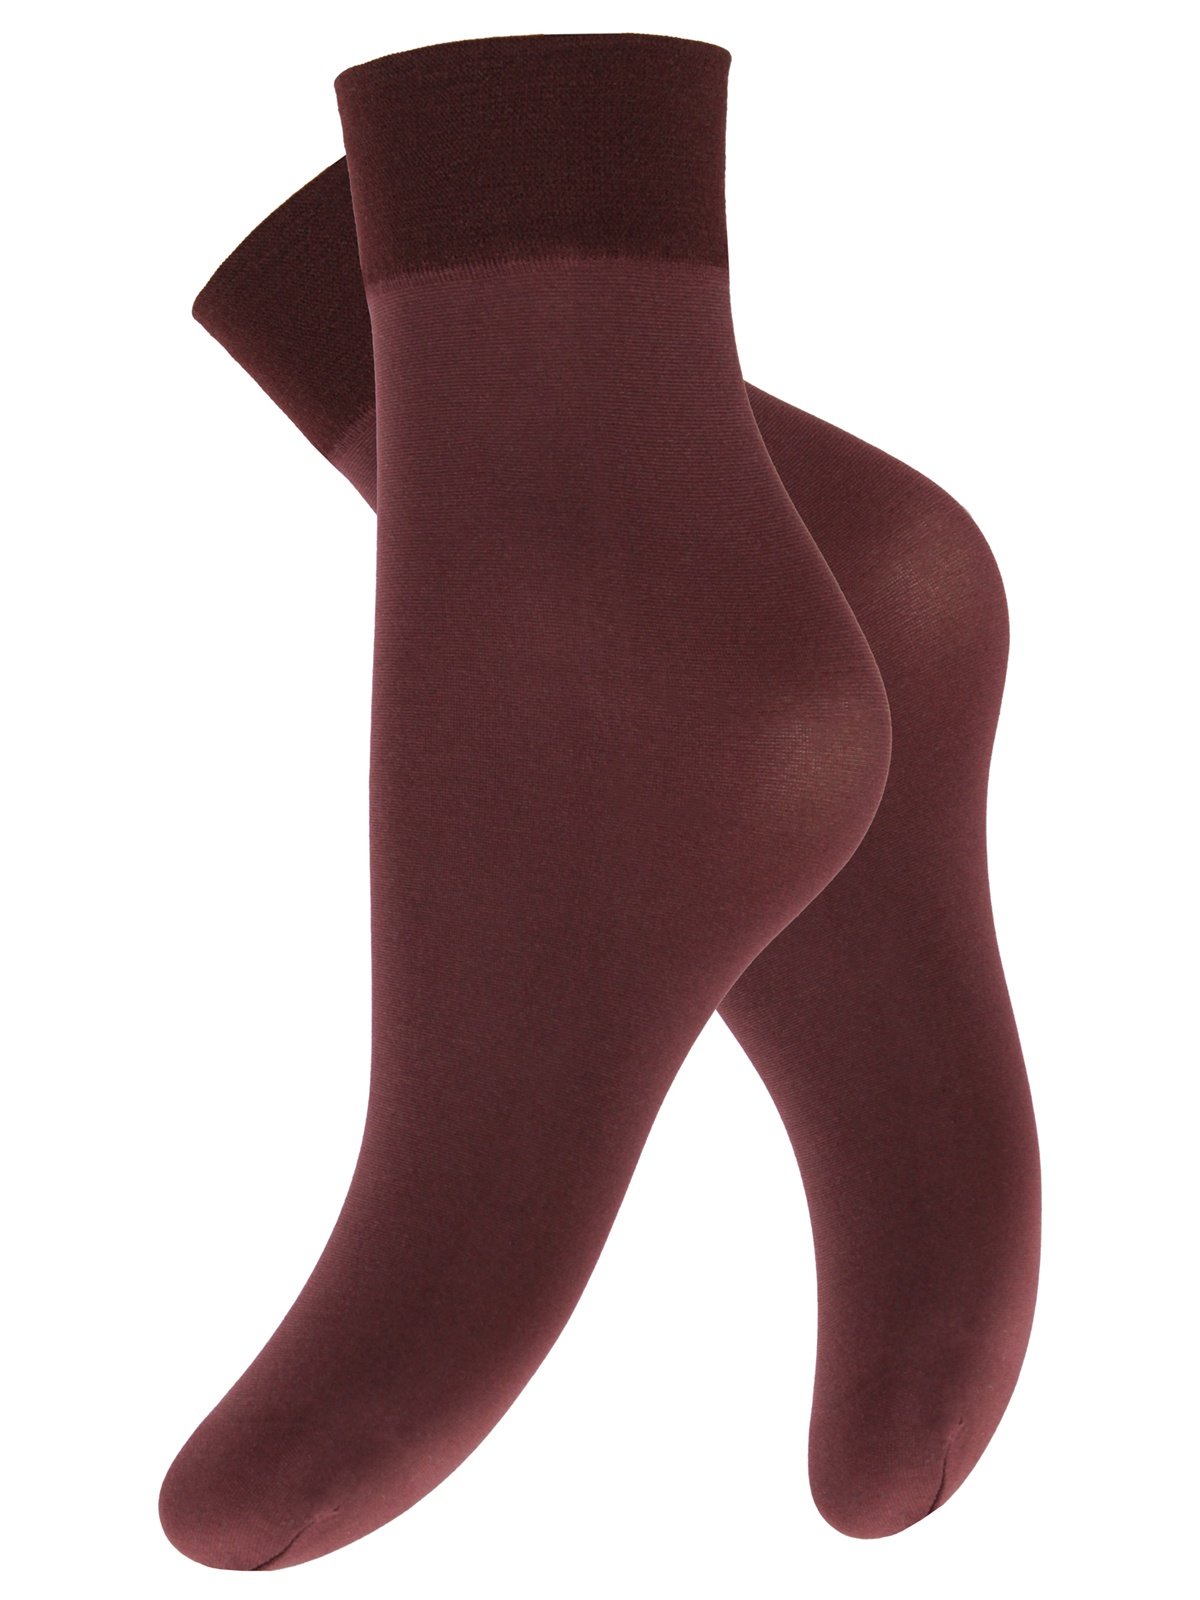 колготки  носки  гетры Носки Trasparenze